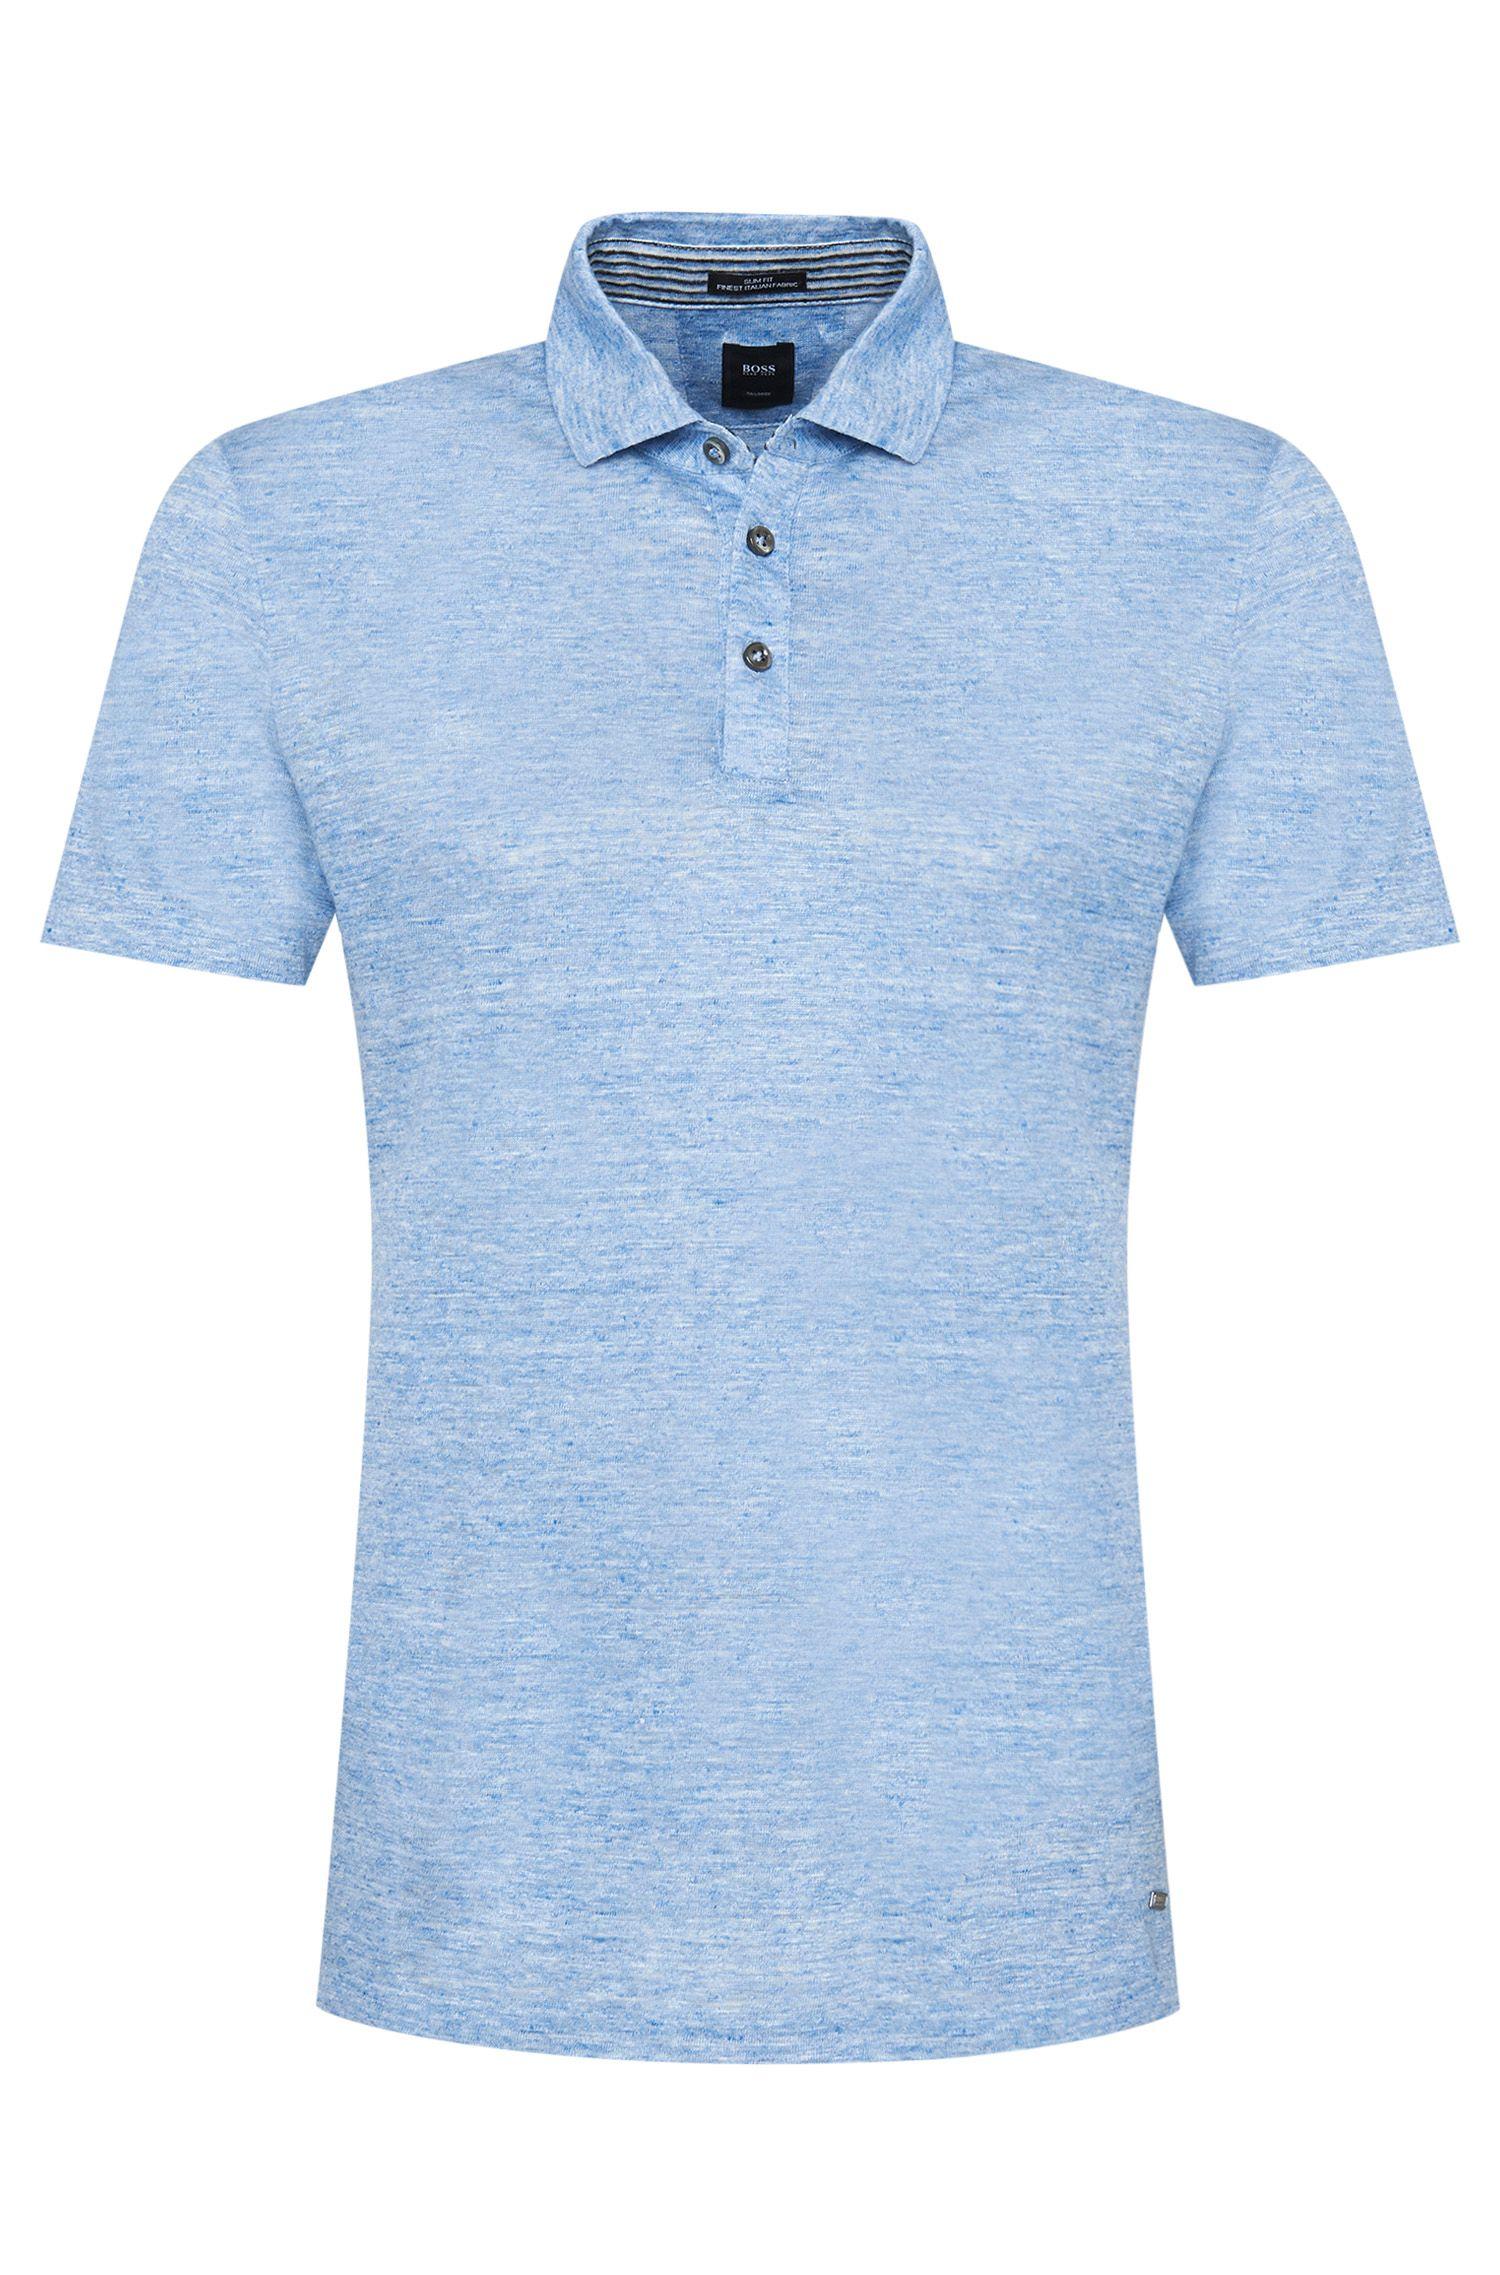 'T-Pryde' | Slim Fit, Italian Linen Polo Shirt